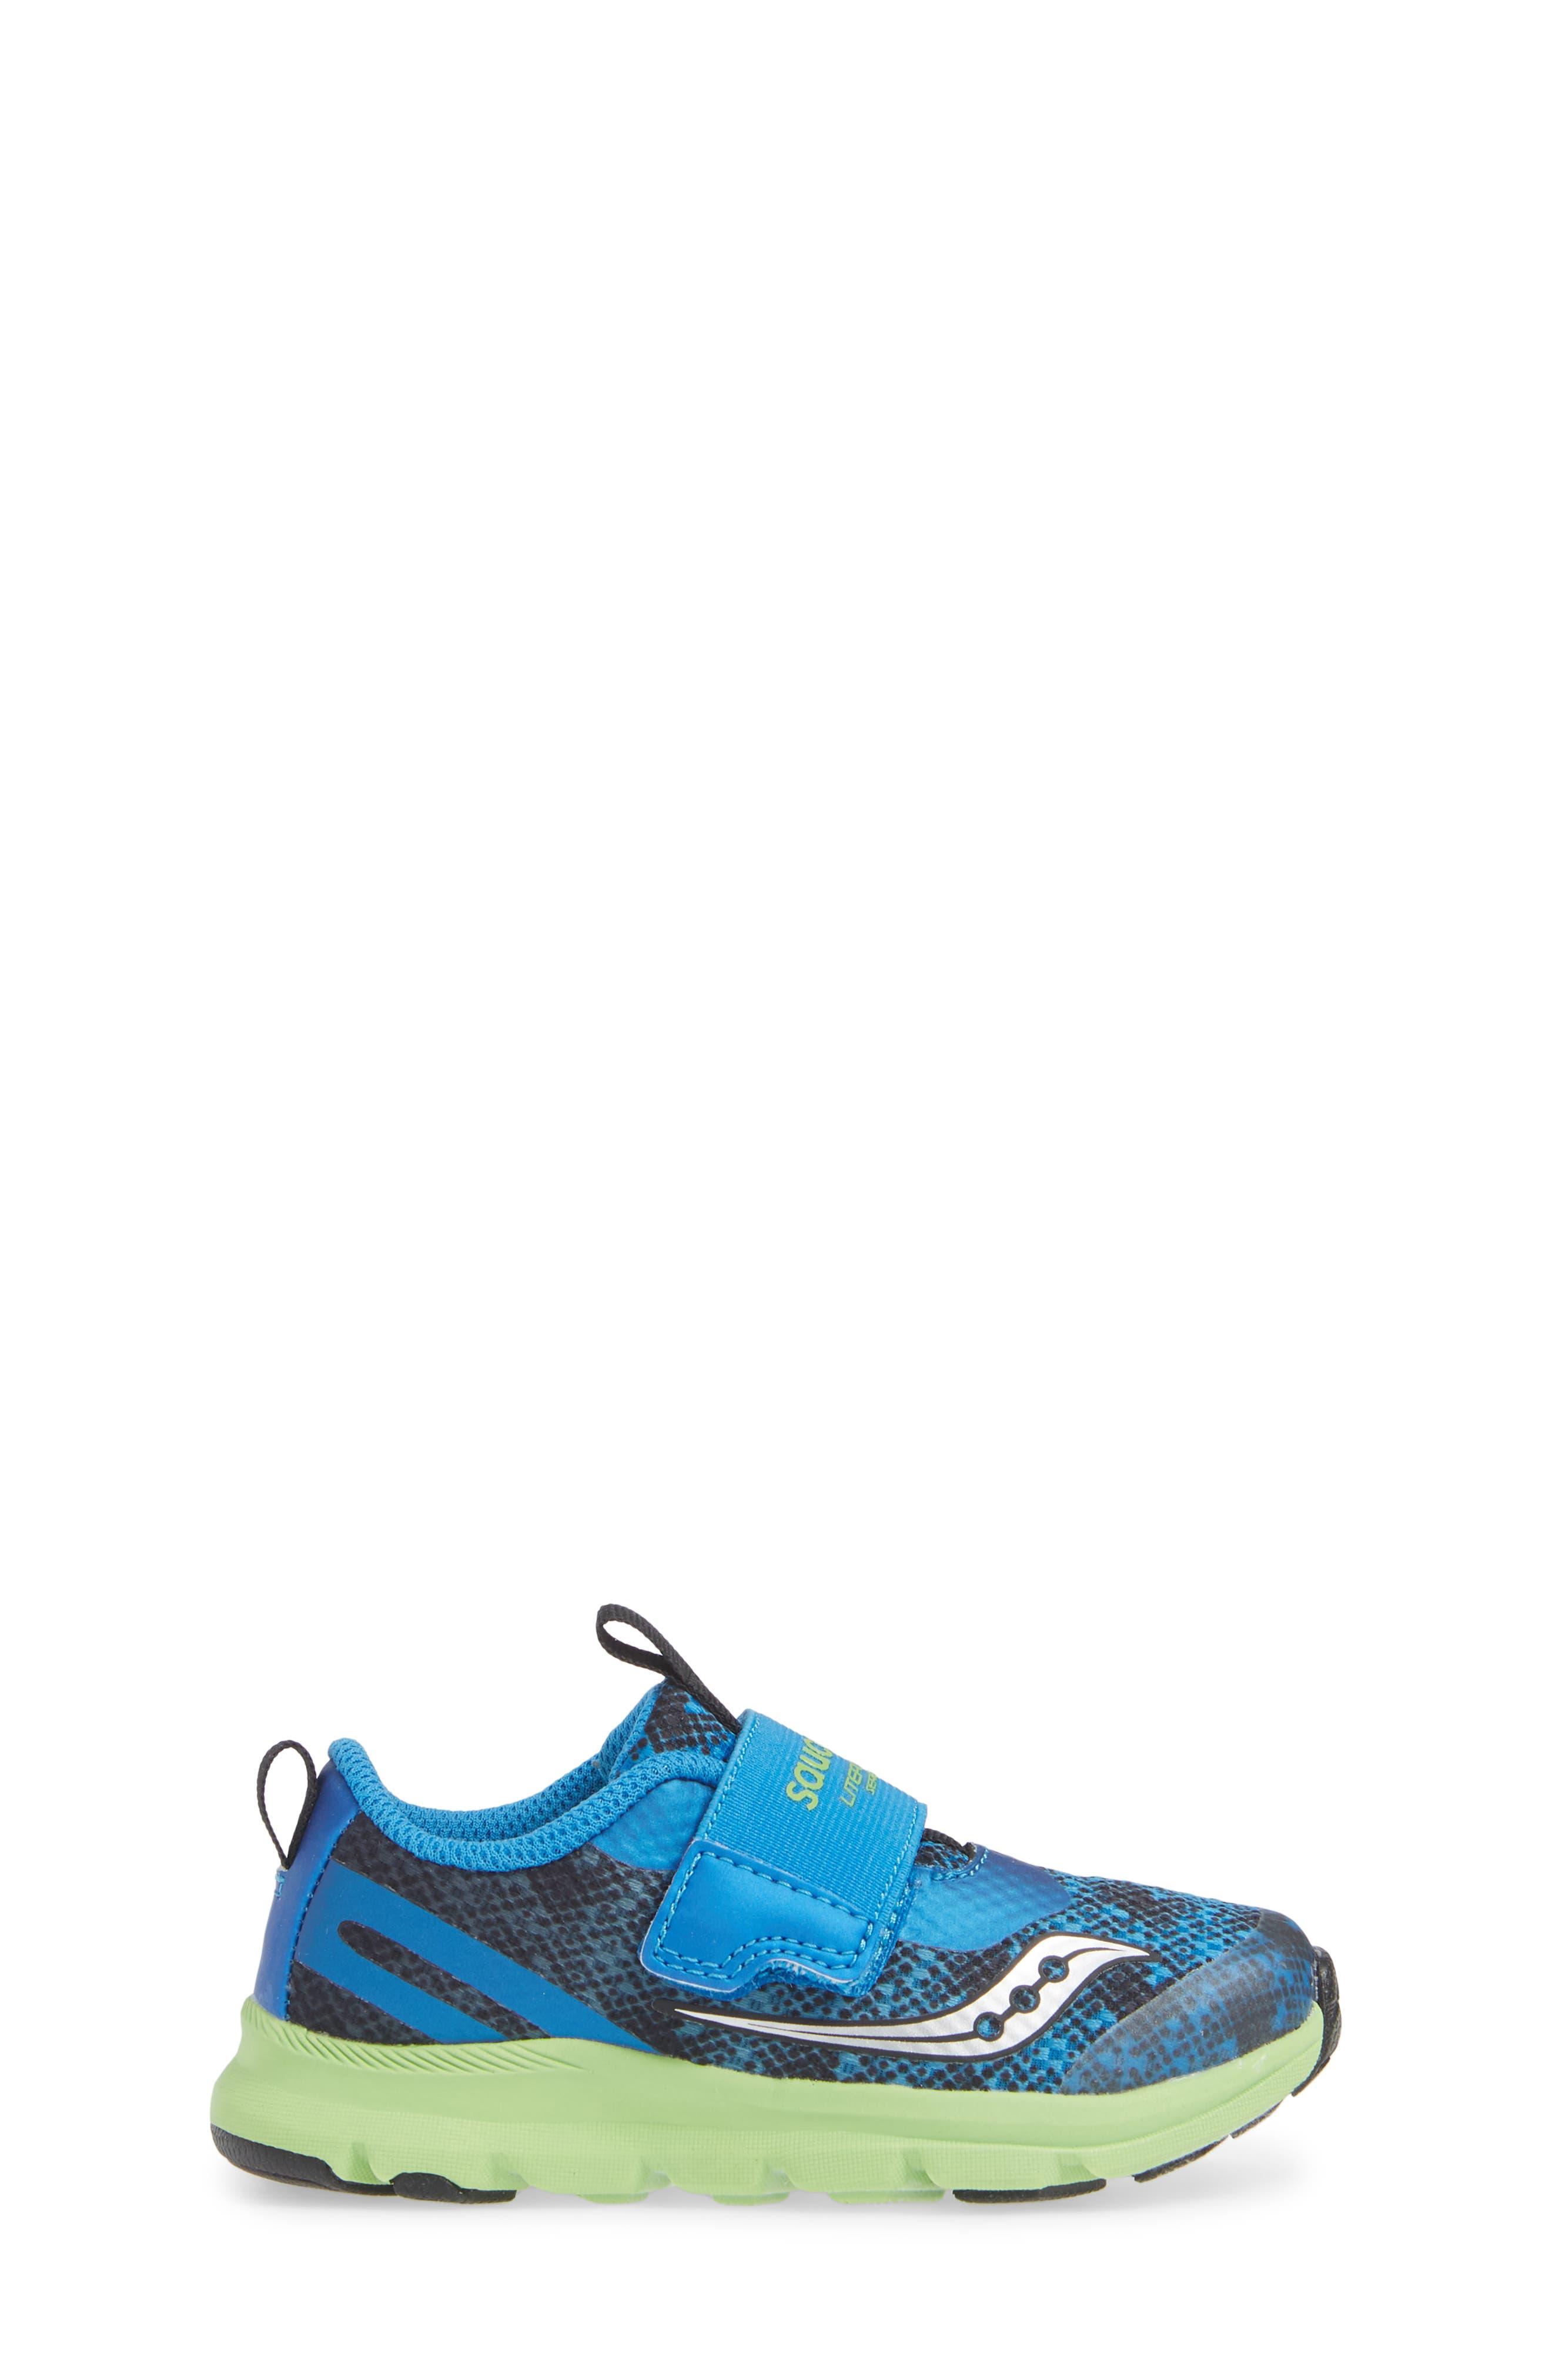 Baby Liteform Sneaker,                             Alternate thumbnail 3, color,                             BLUE/ GREEN